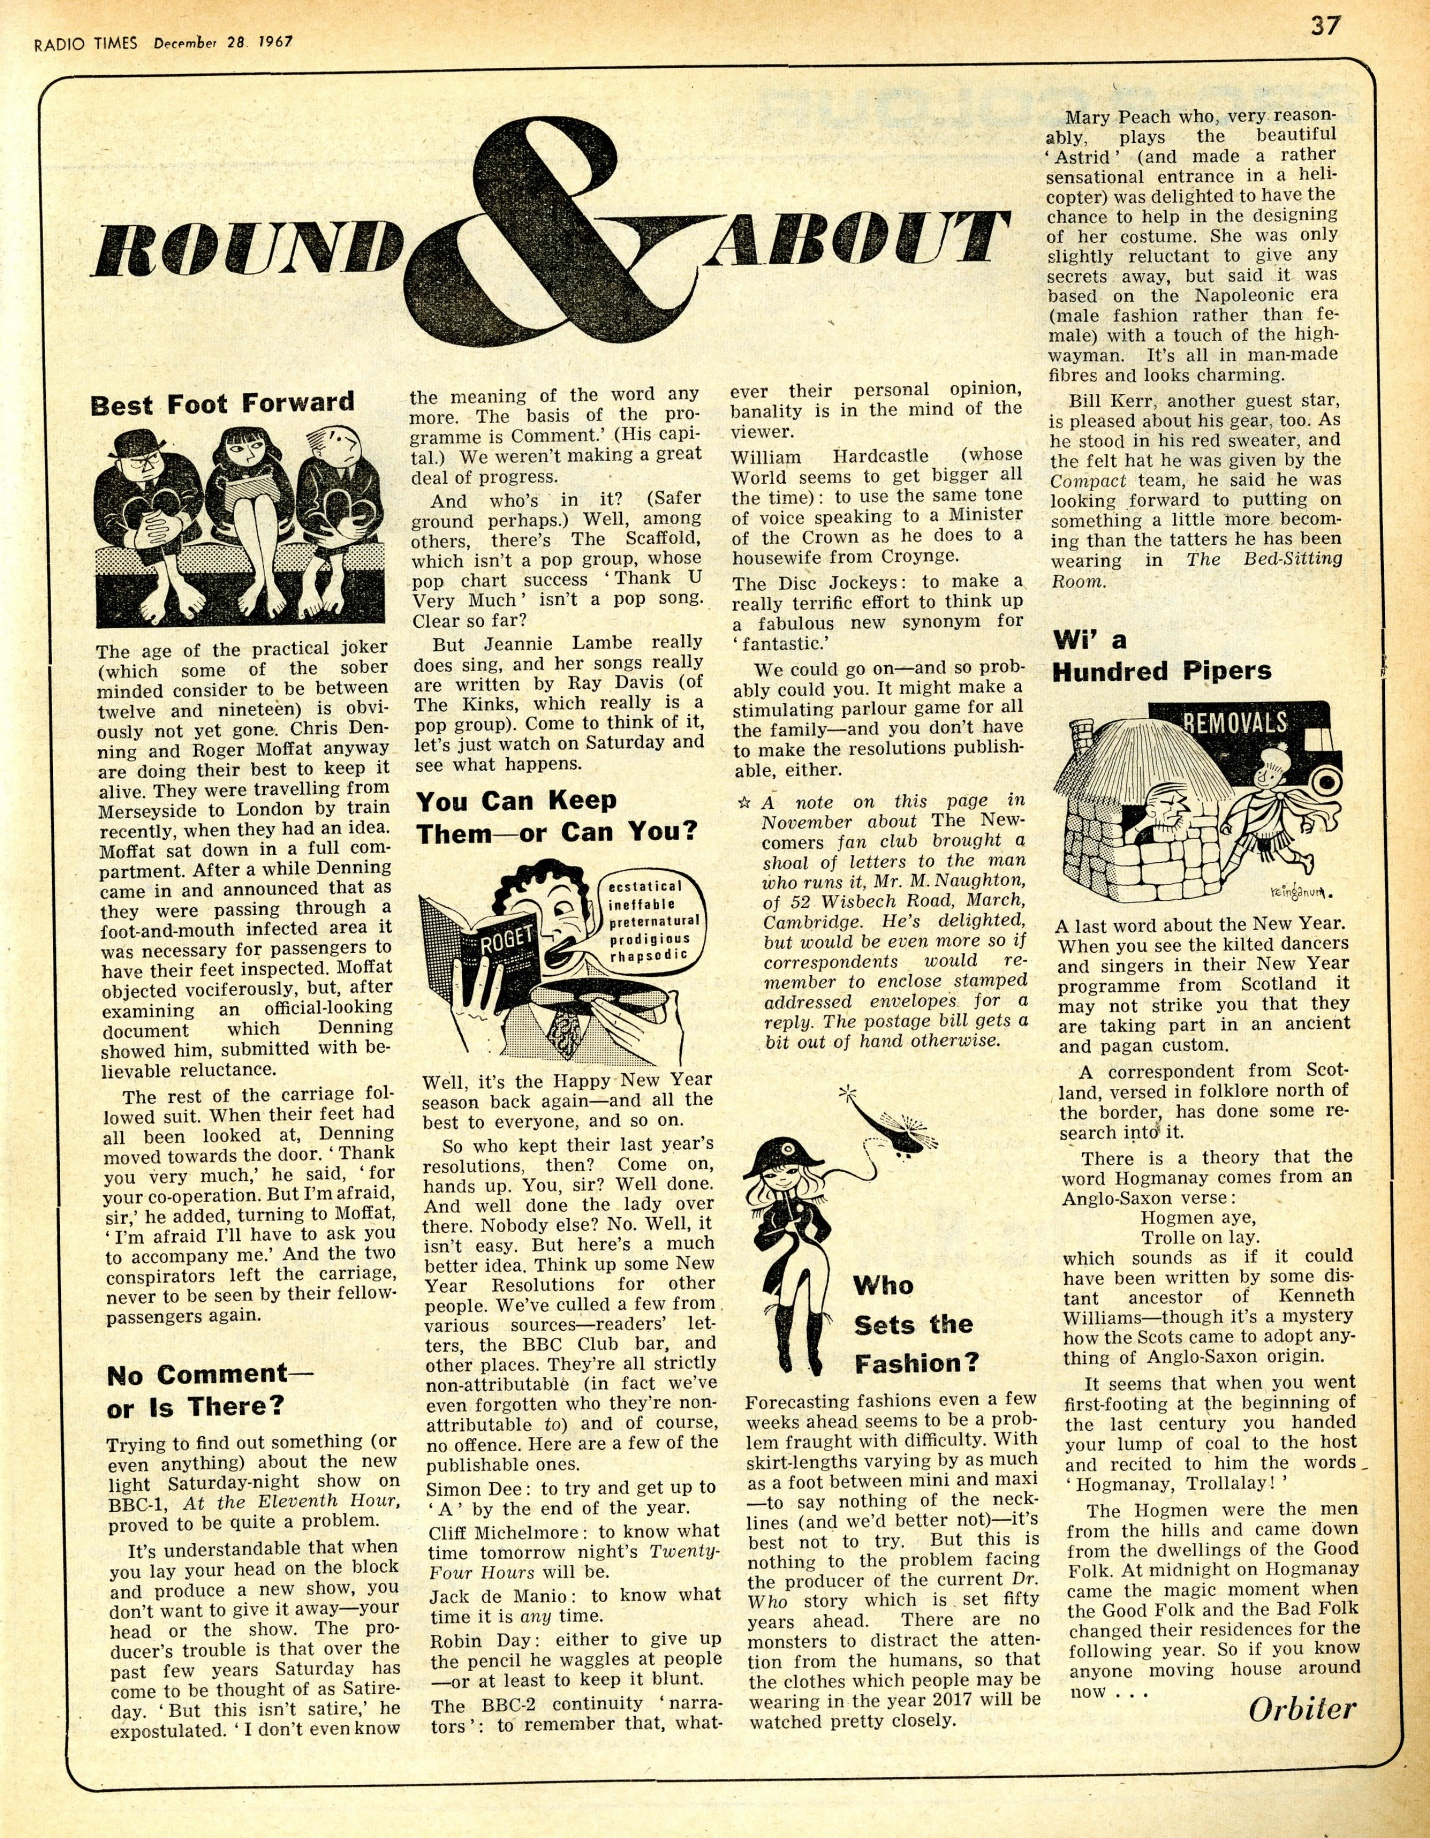 Radio Times, 30 December 1967 - 5 January 1968